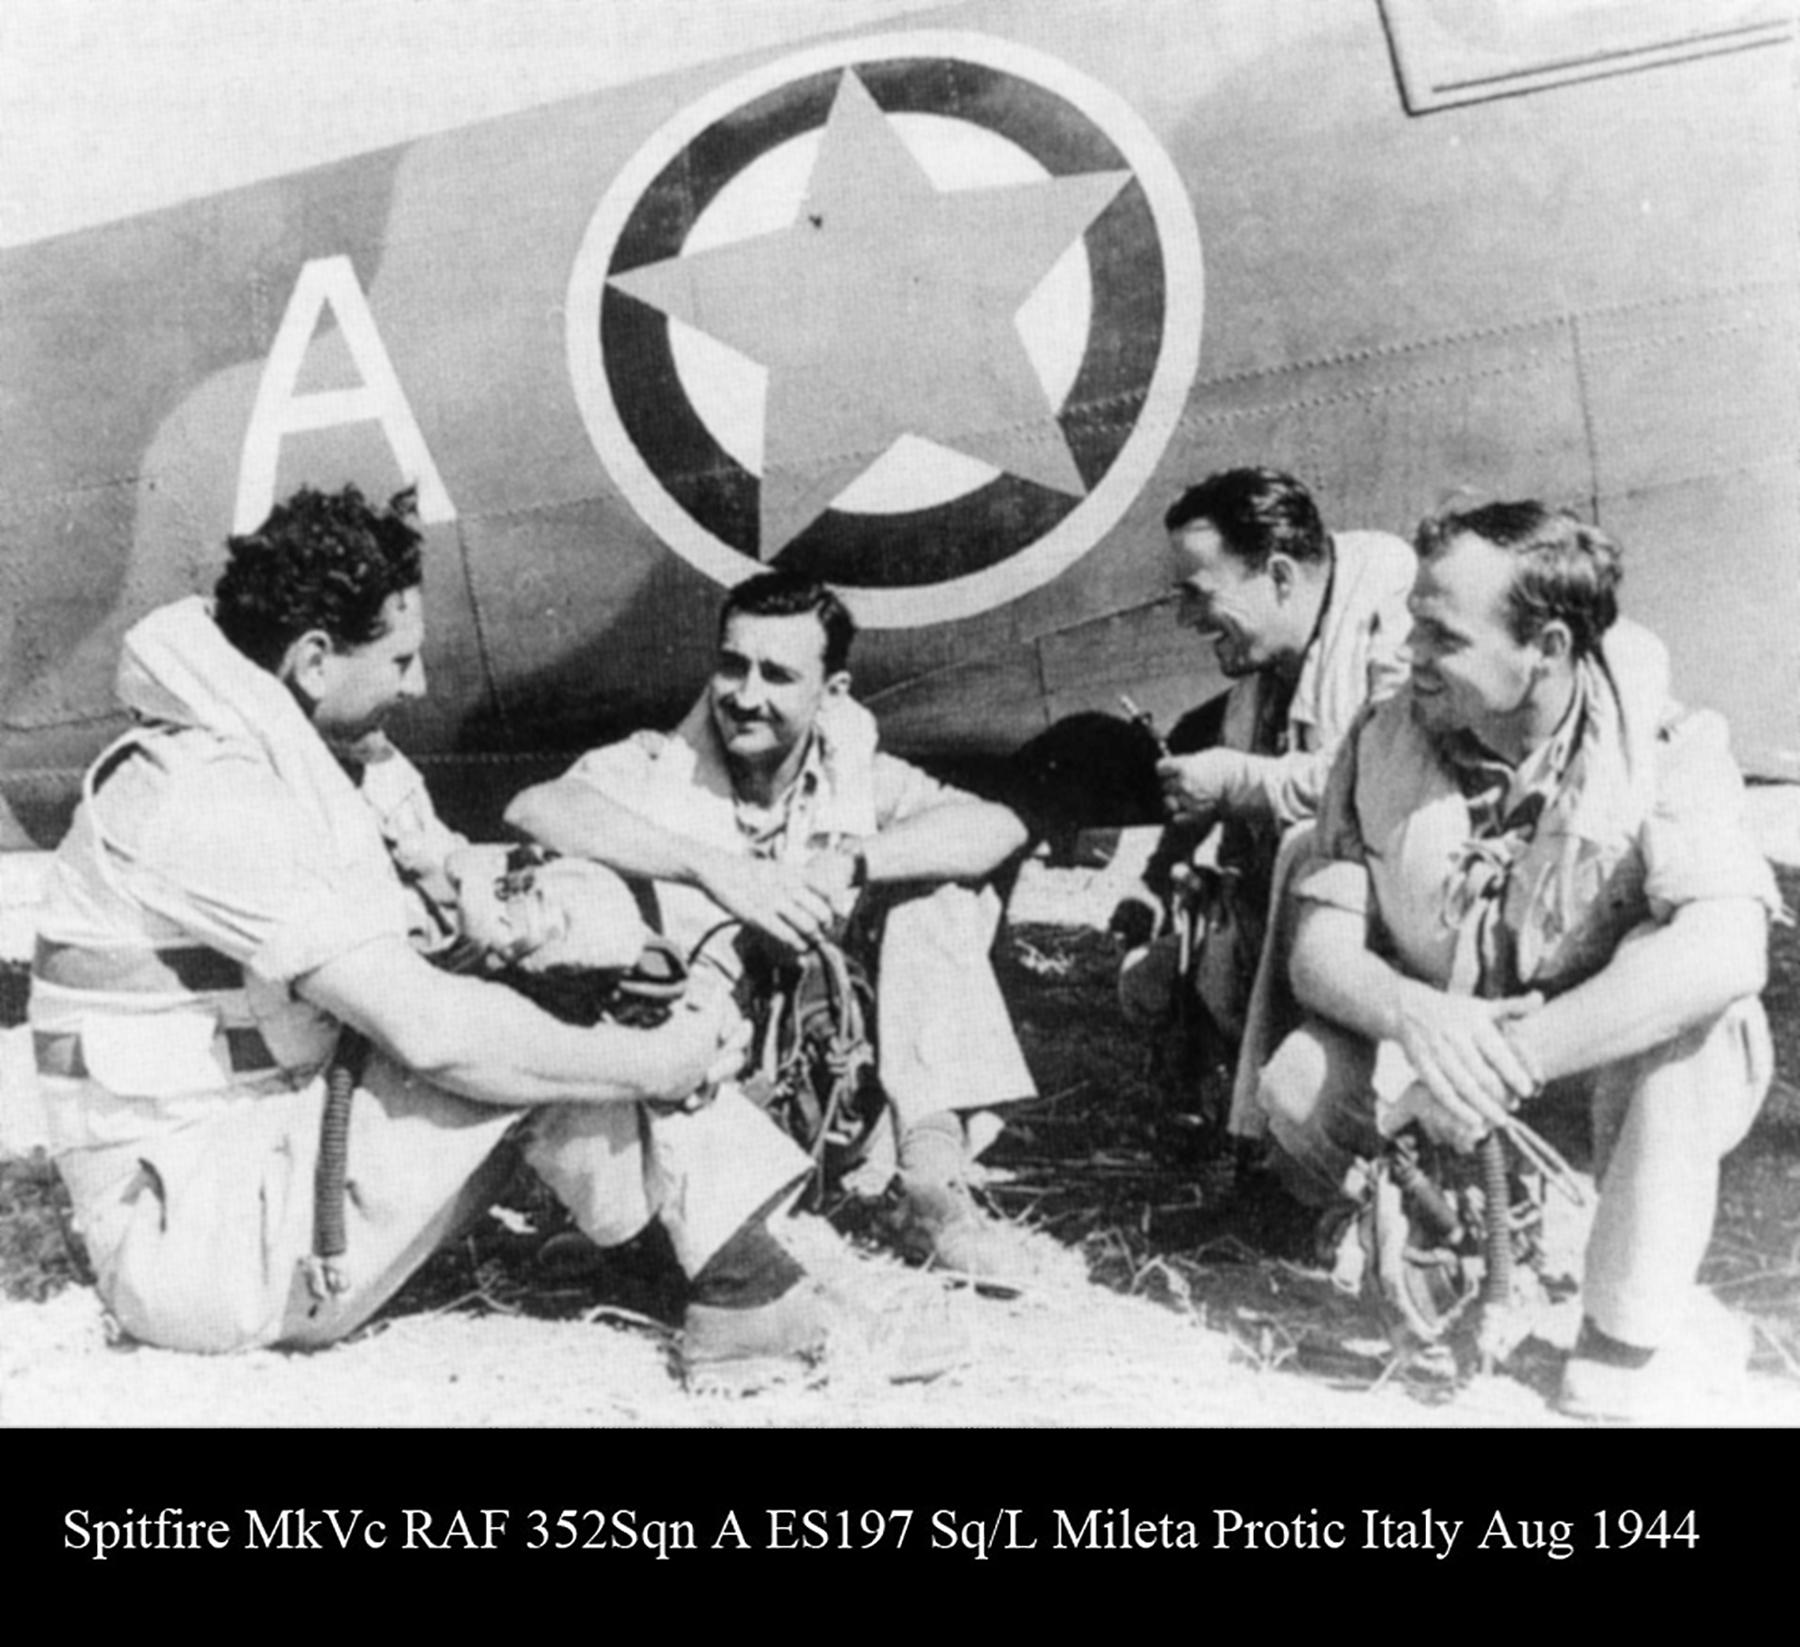 Spitfire MkVc RAF 352Sqn A ES197 Mileta Protic Italy Aug 1944 01